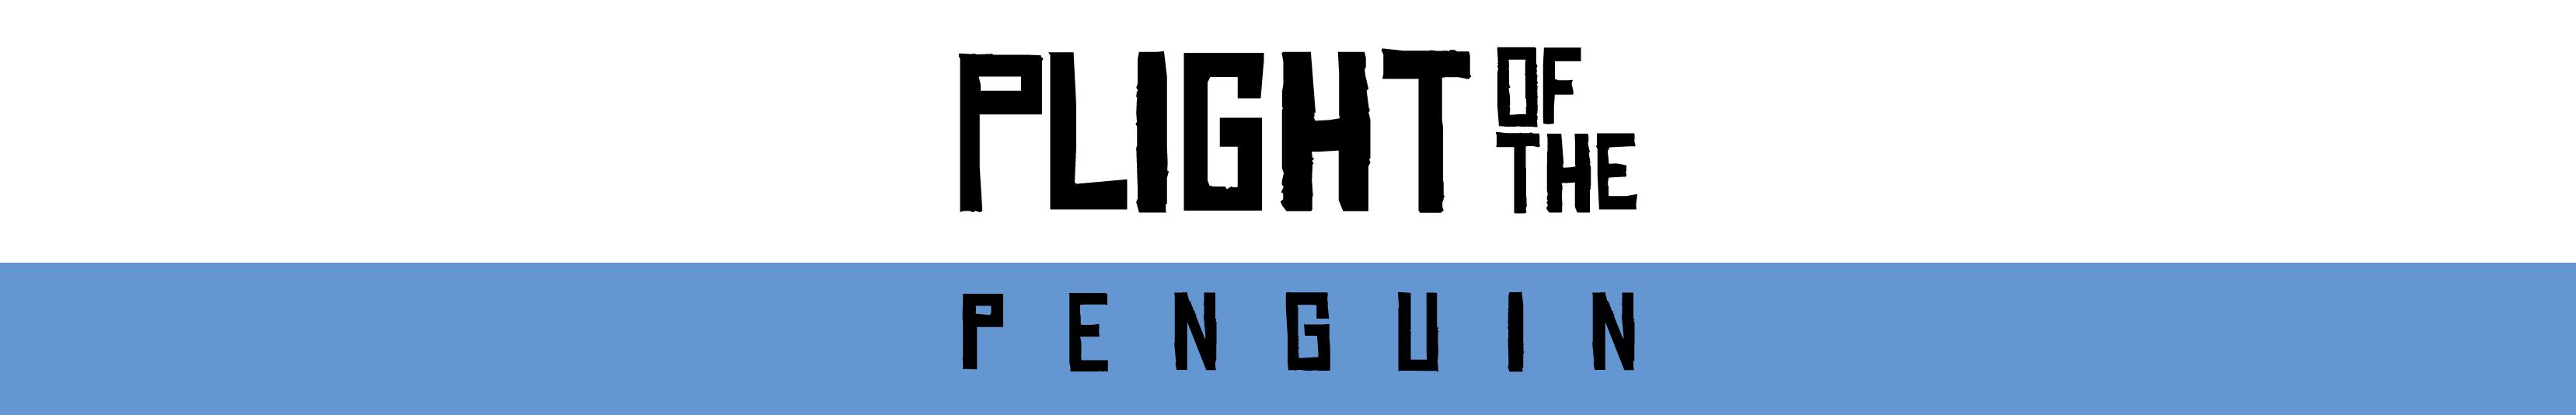 Plight of the Penguin